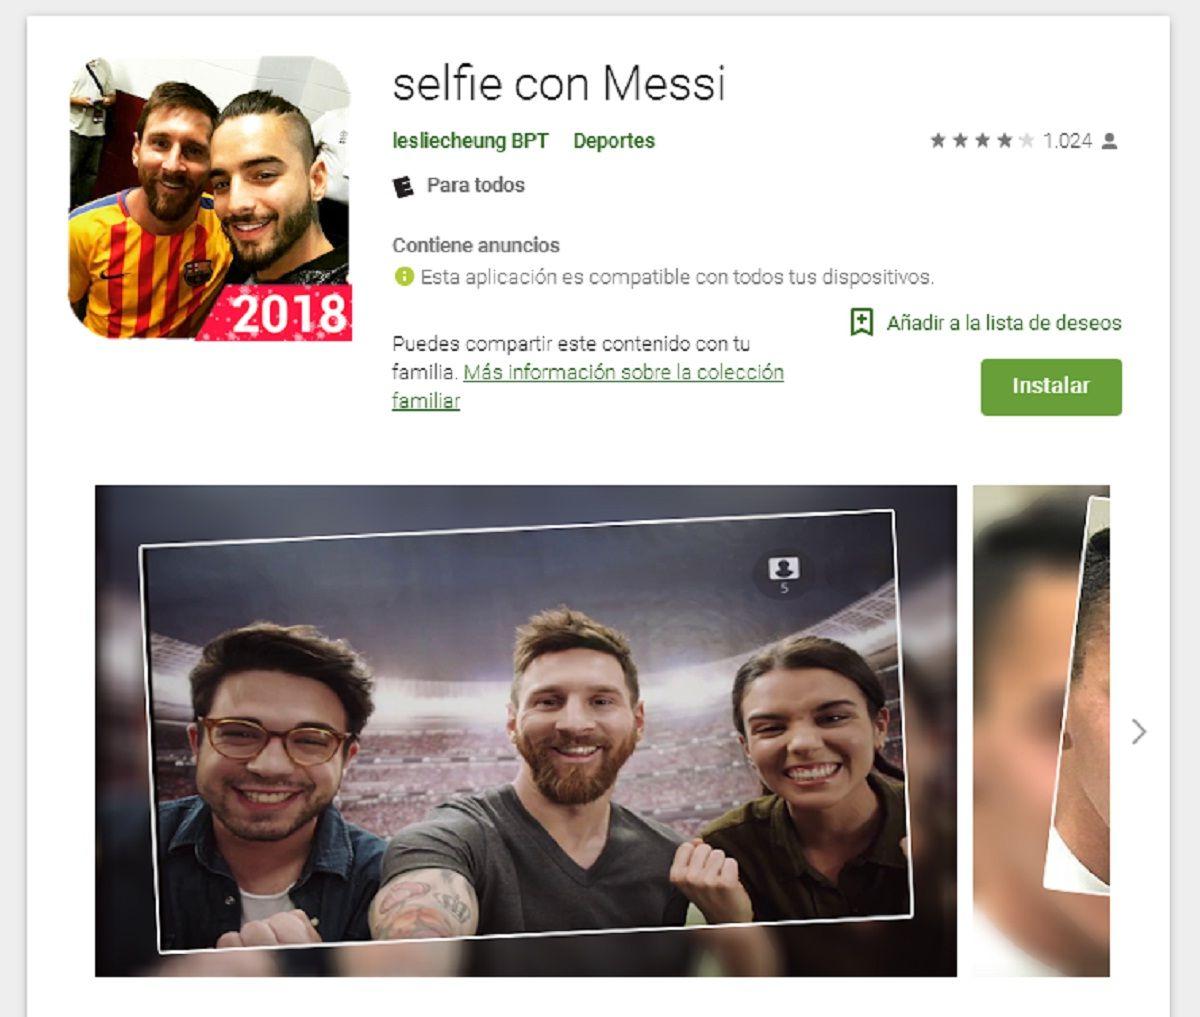 Selfie con Messi